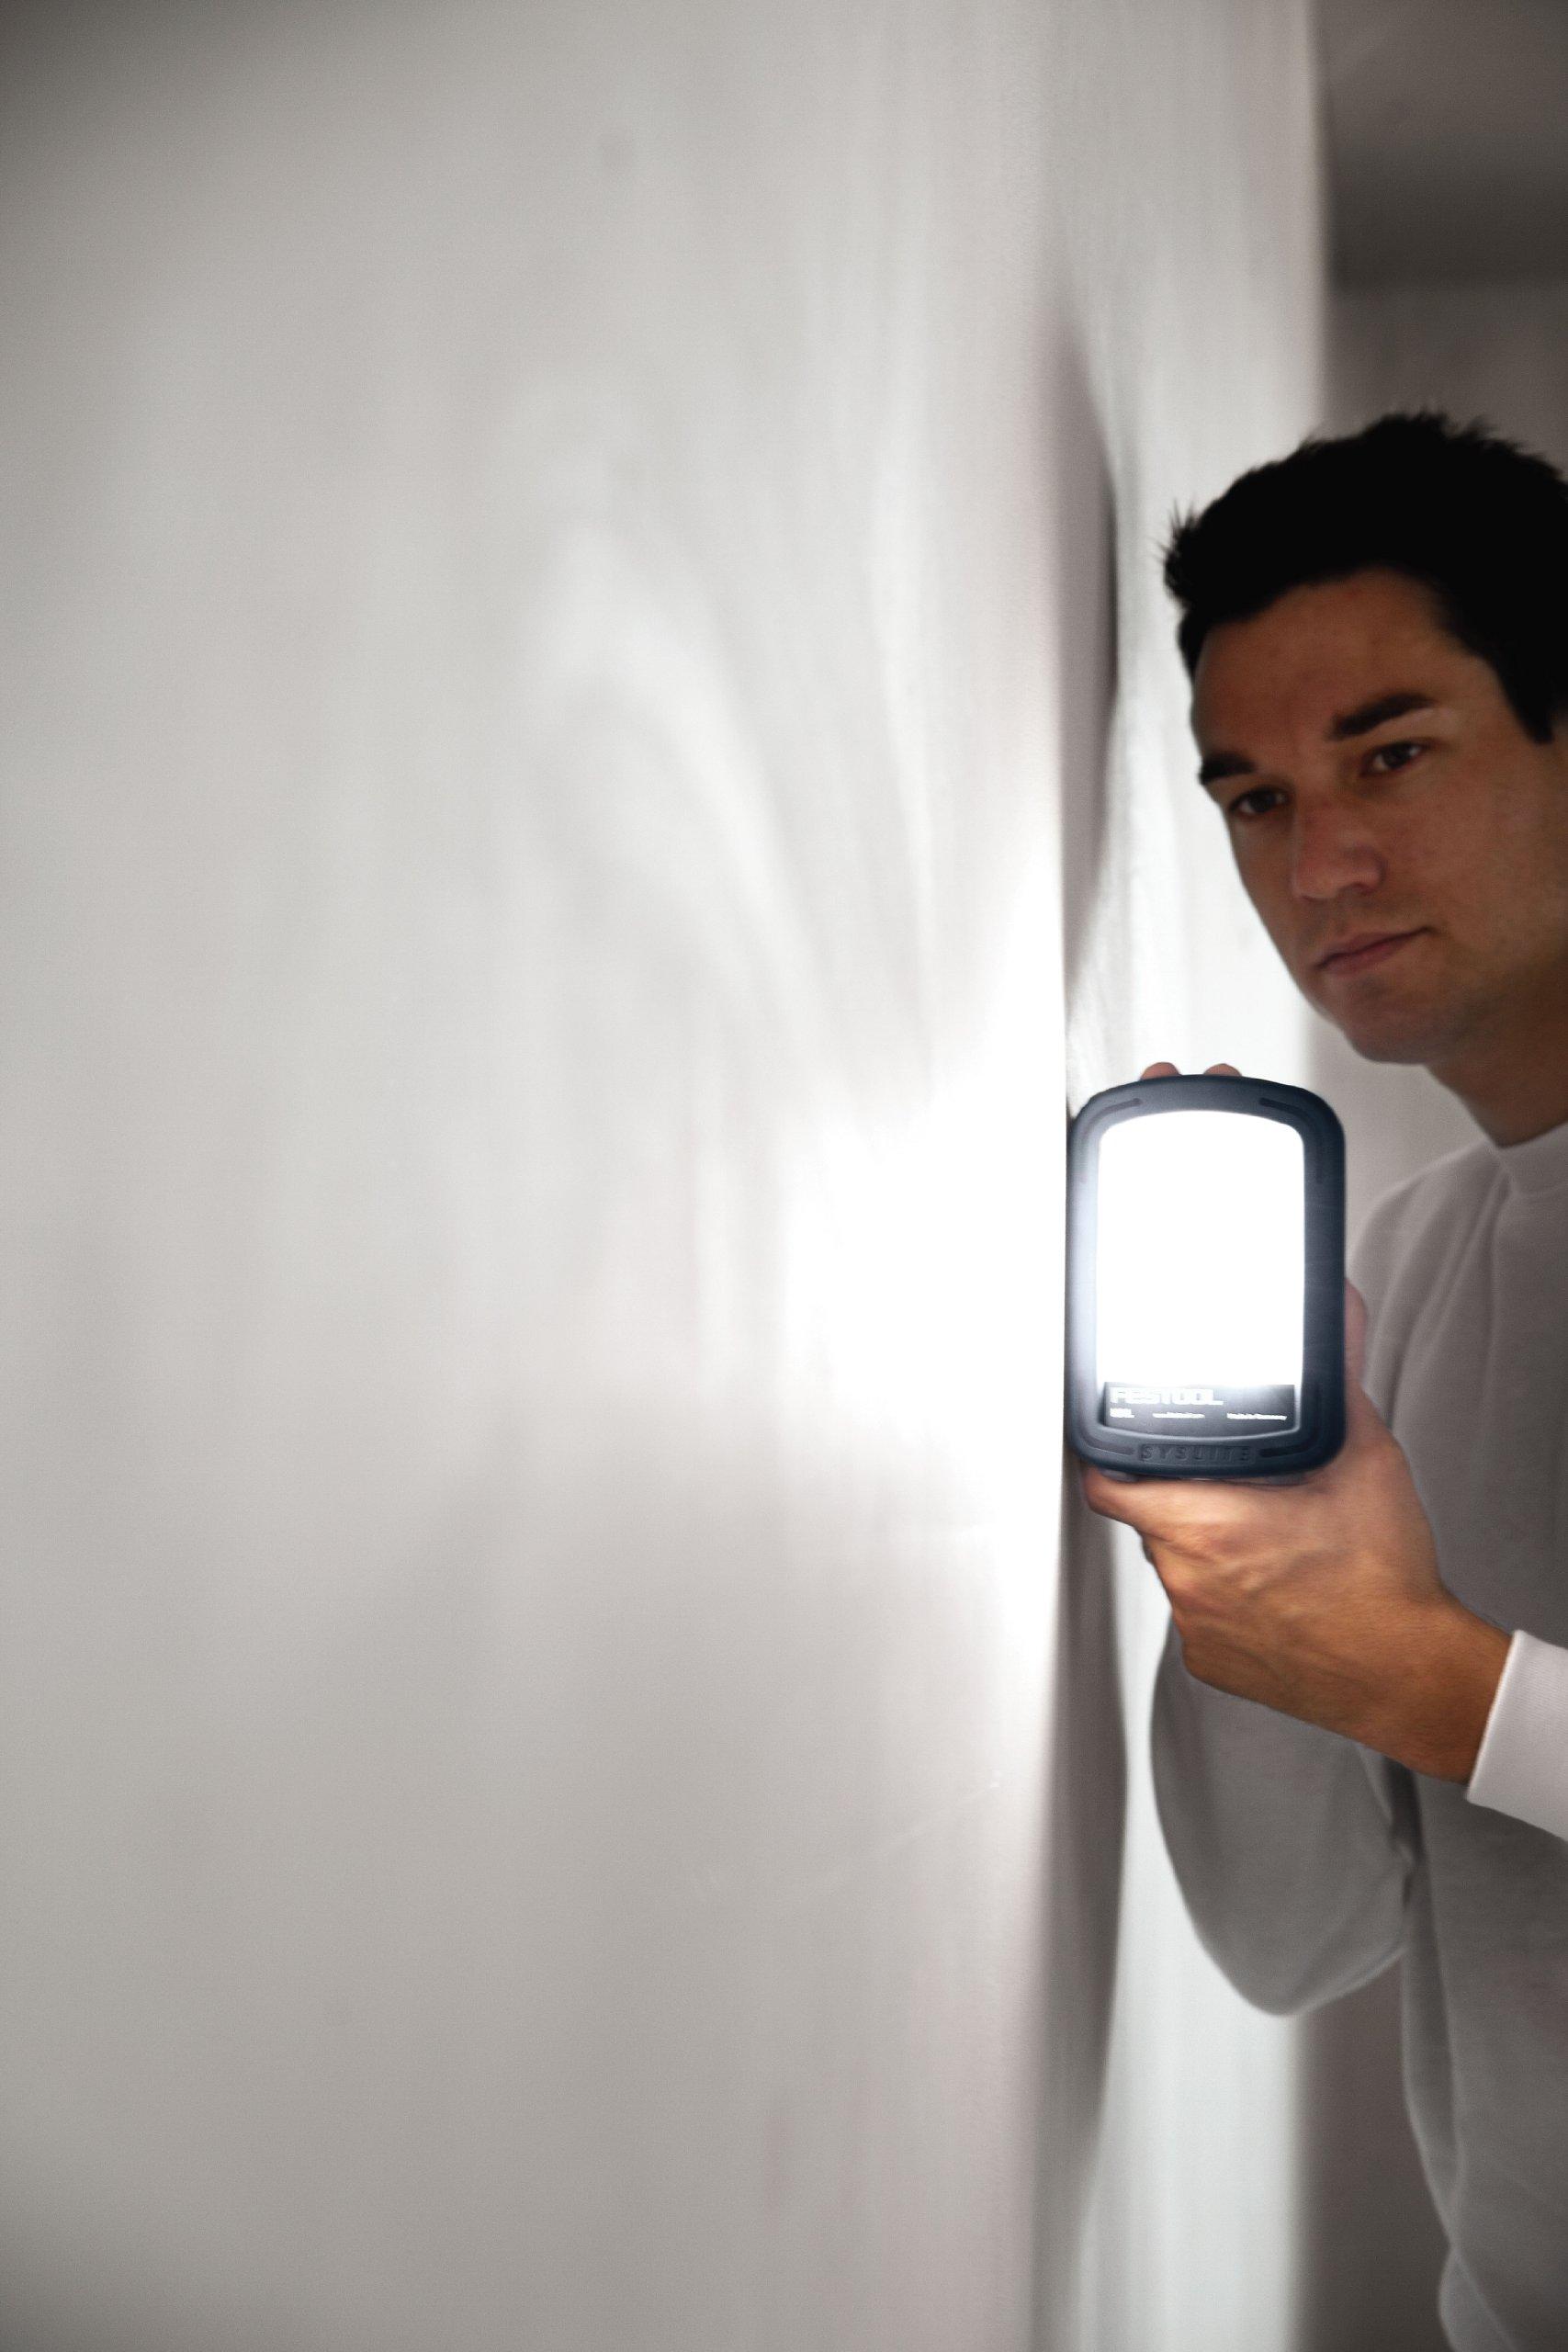 Festool 498568 SysLite LED Work Lamp by Festool (Image #4)